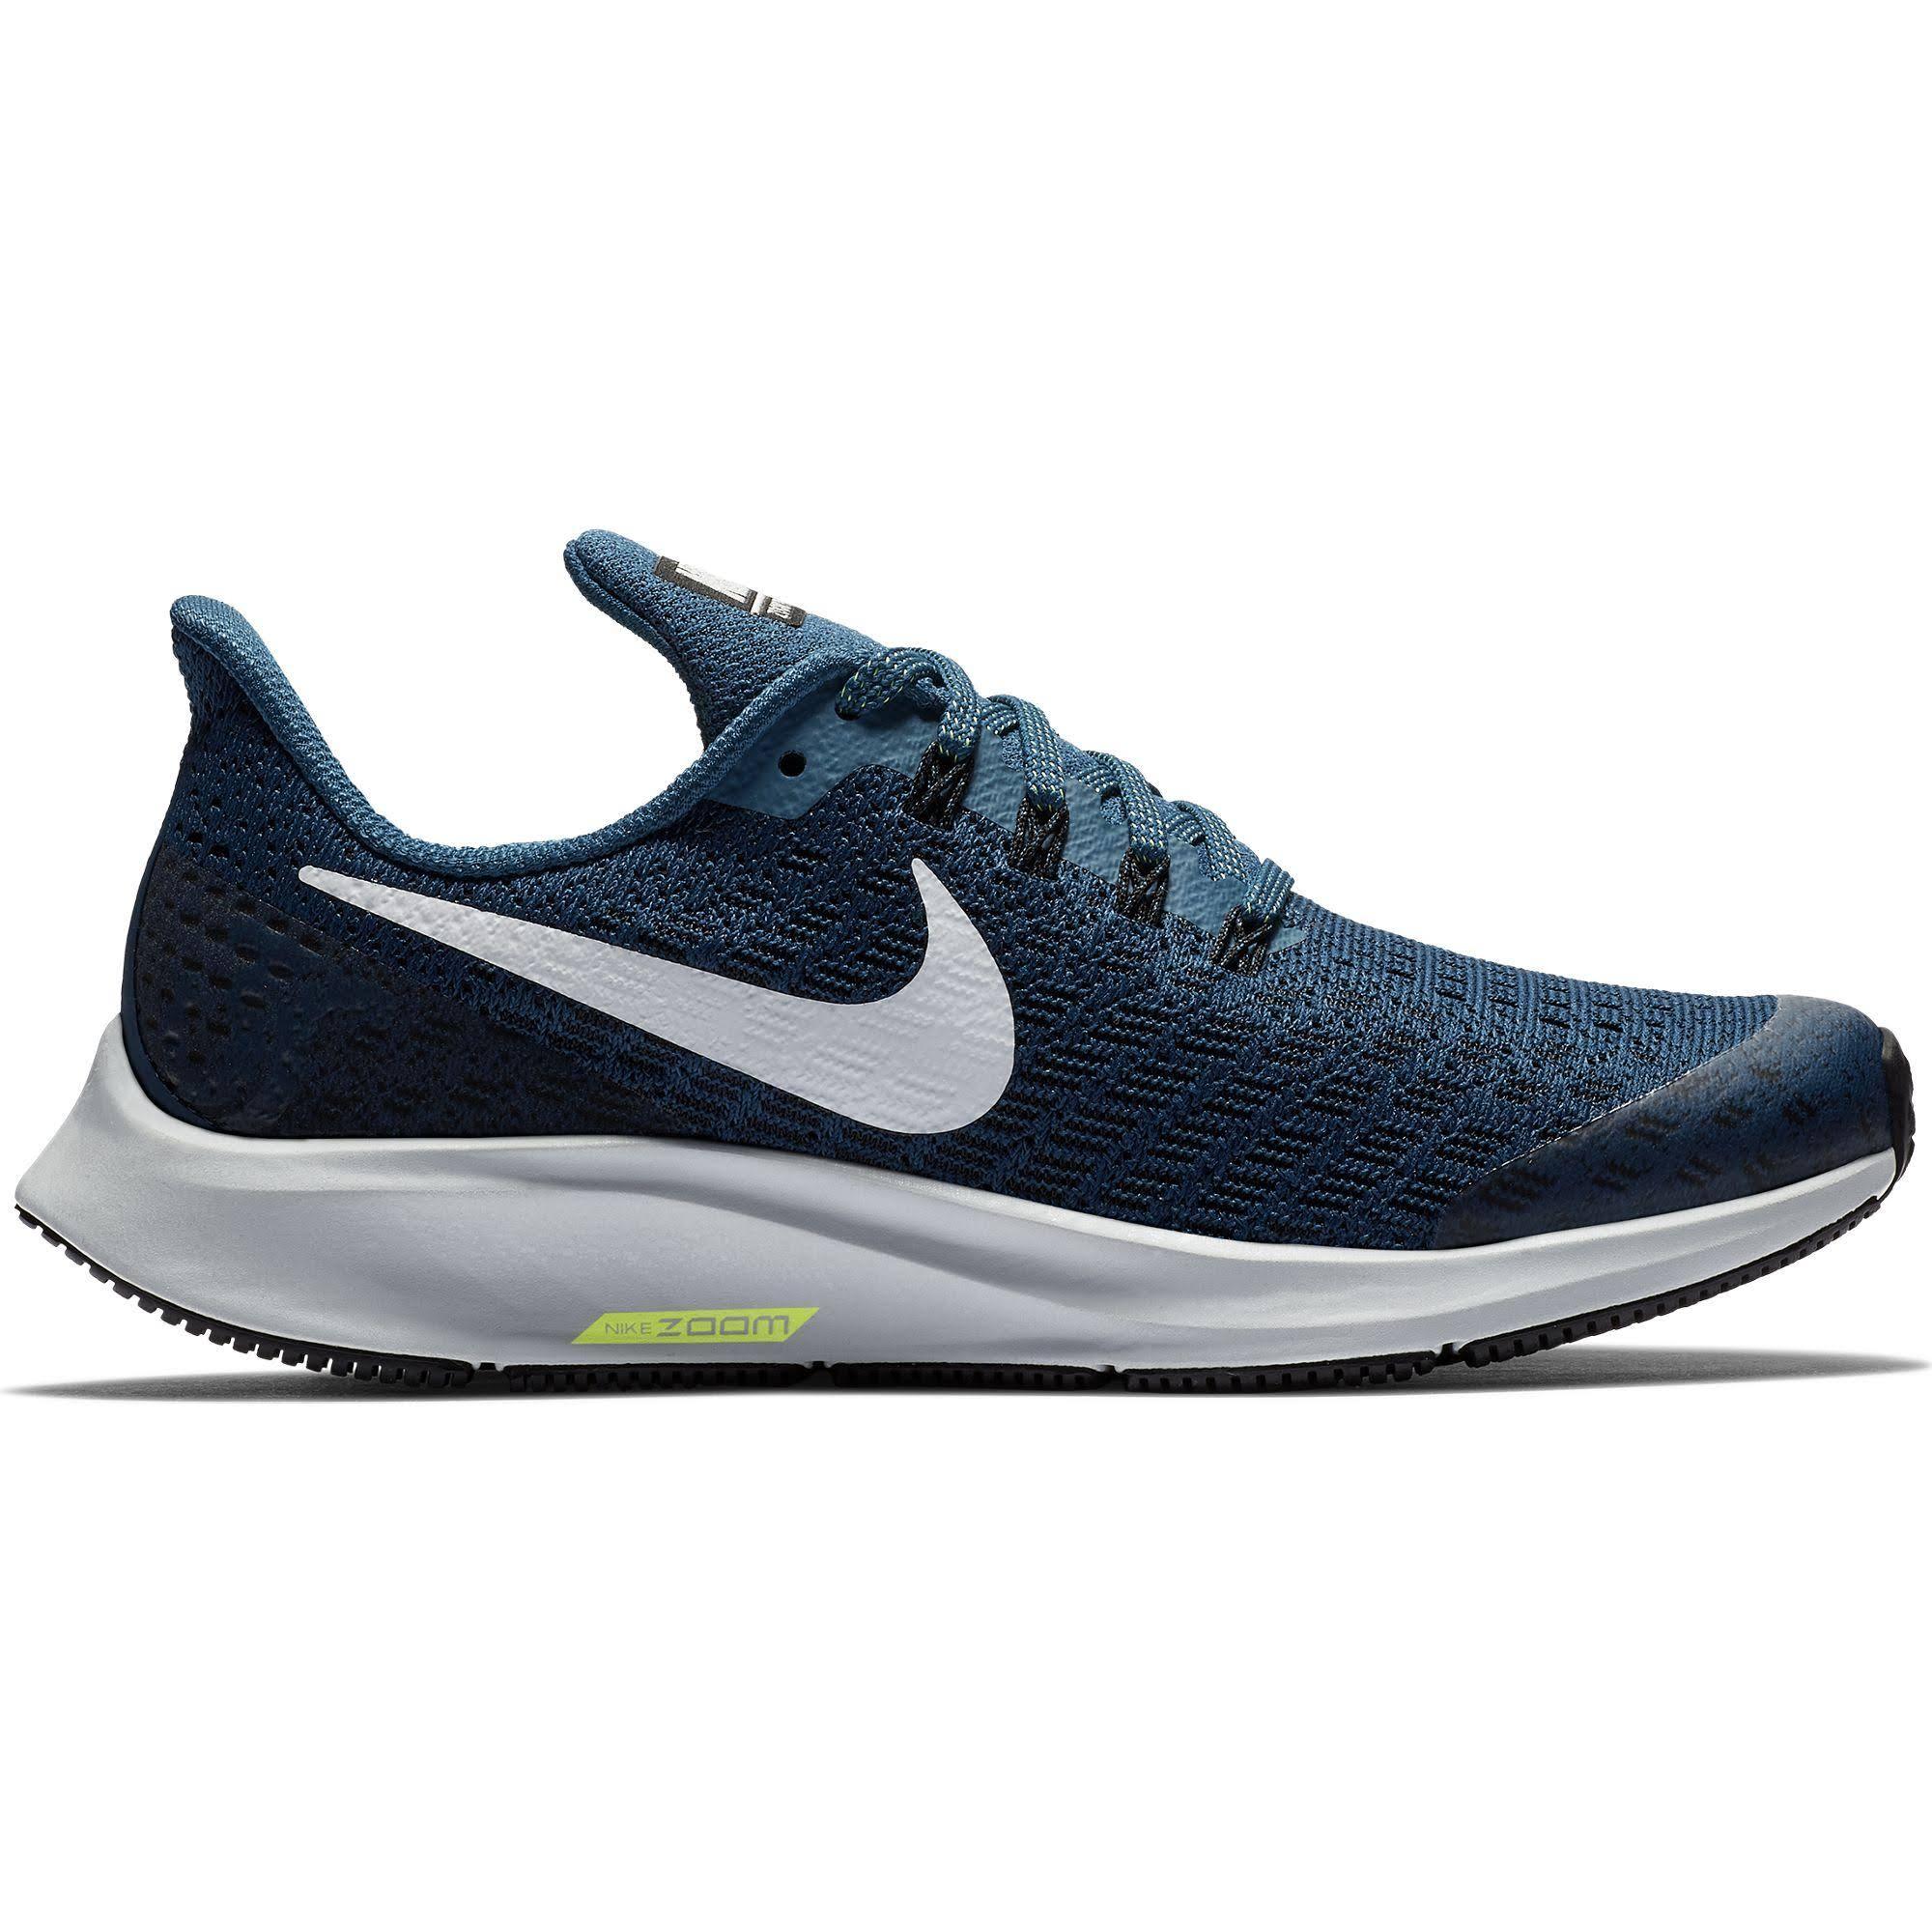 black wolf white Blue Taubenblau Größe Jungen 33 Gewebefasern Nike amp; Low Sneakers Force Tennisschuhe Grey 7cpHq